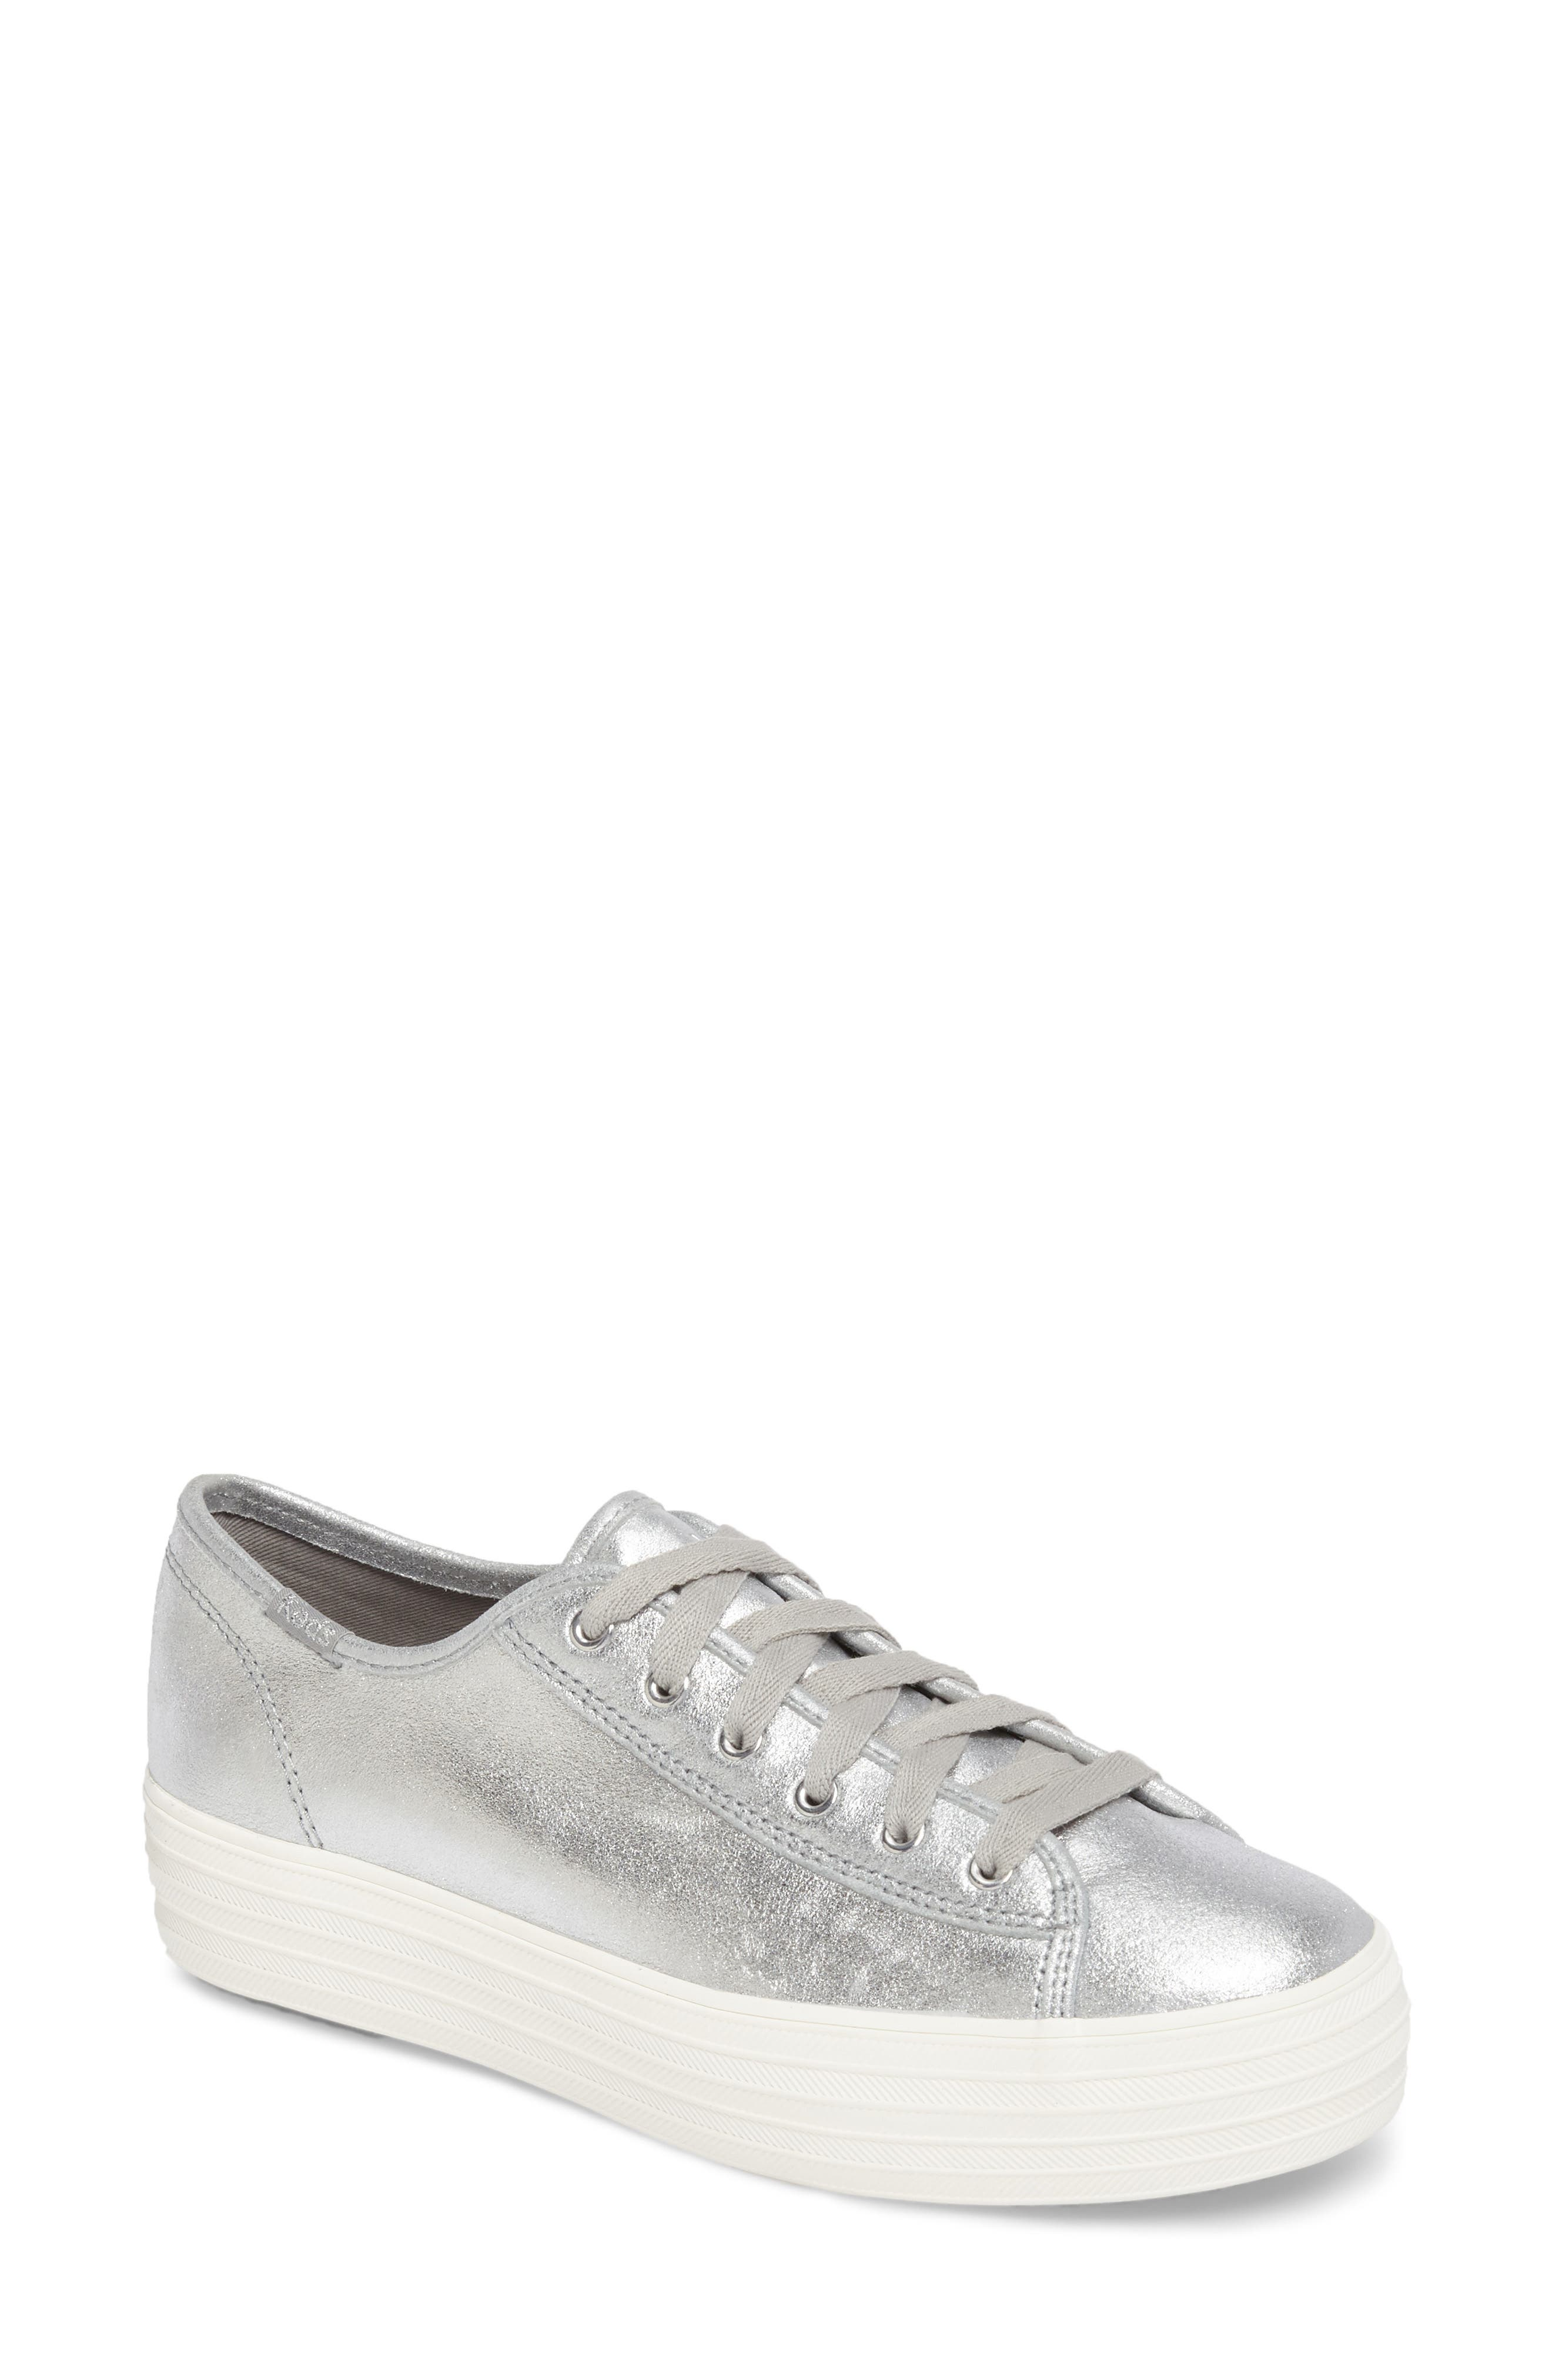 KEDS<SUP>®</SUP> Triple Kick Platform Sneaker